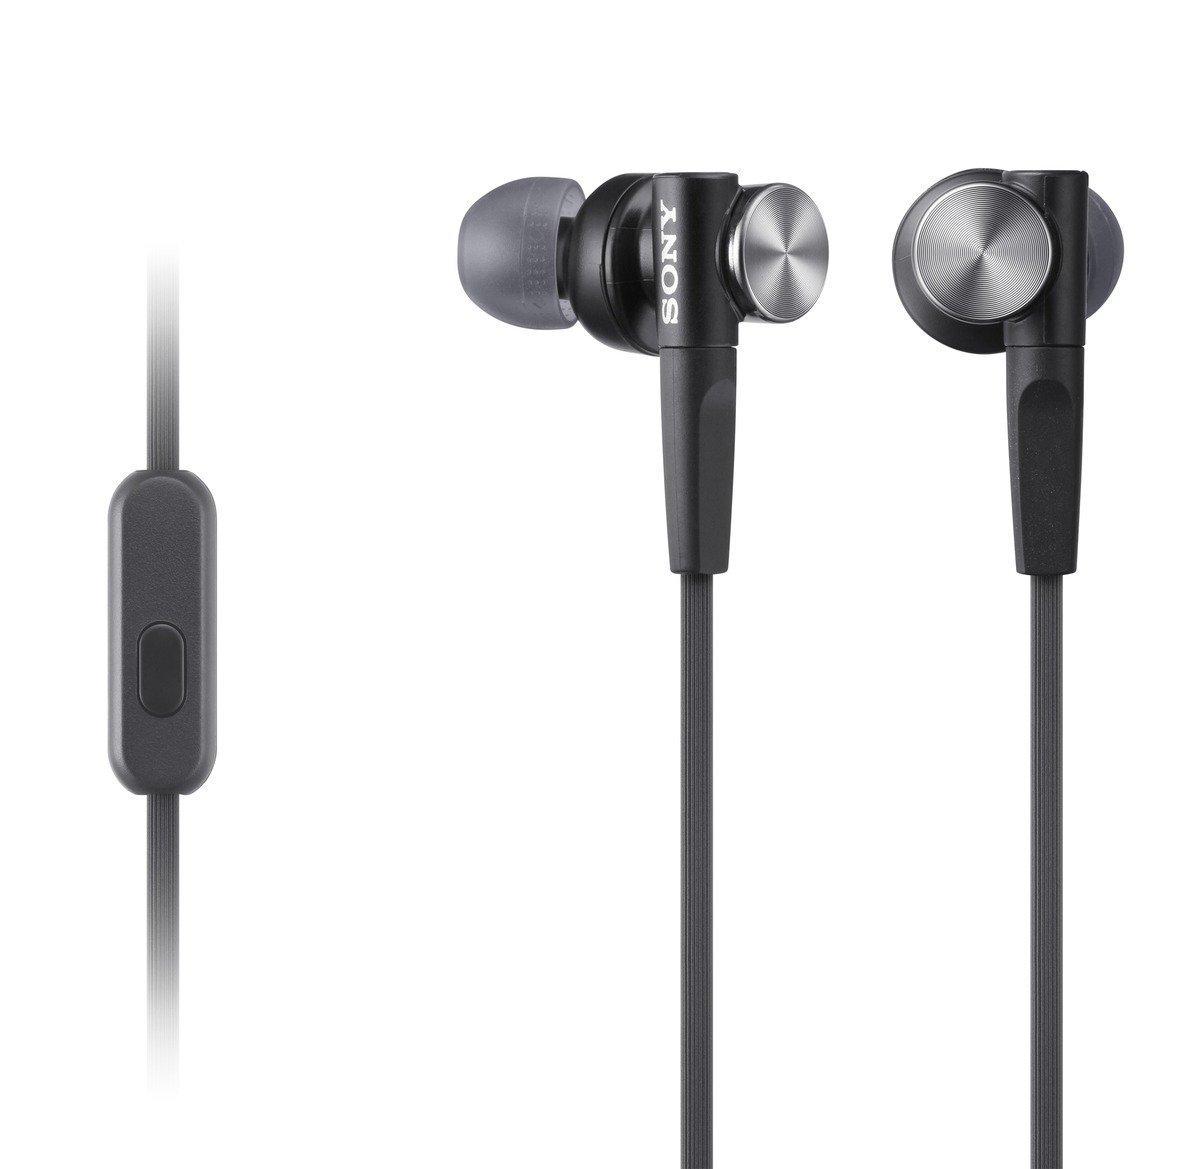 SONY MDRXB50APB - Ecouteurs filaires